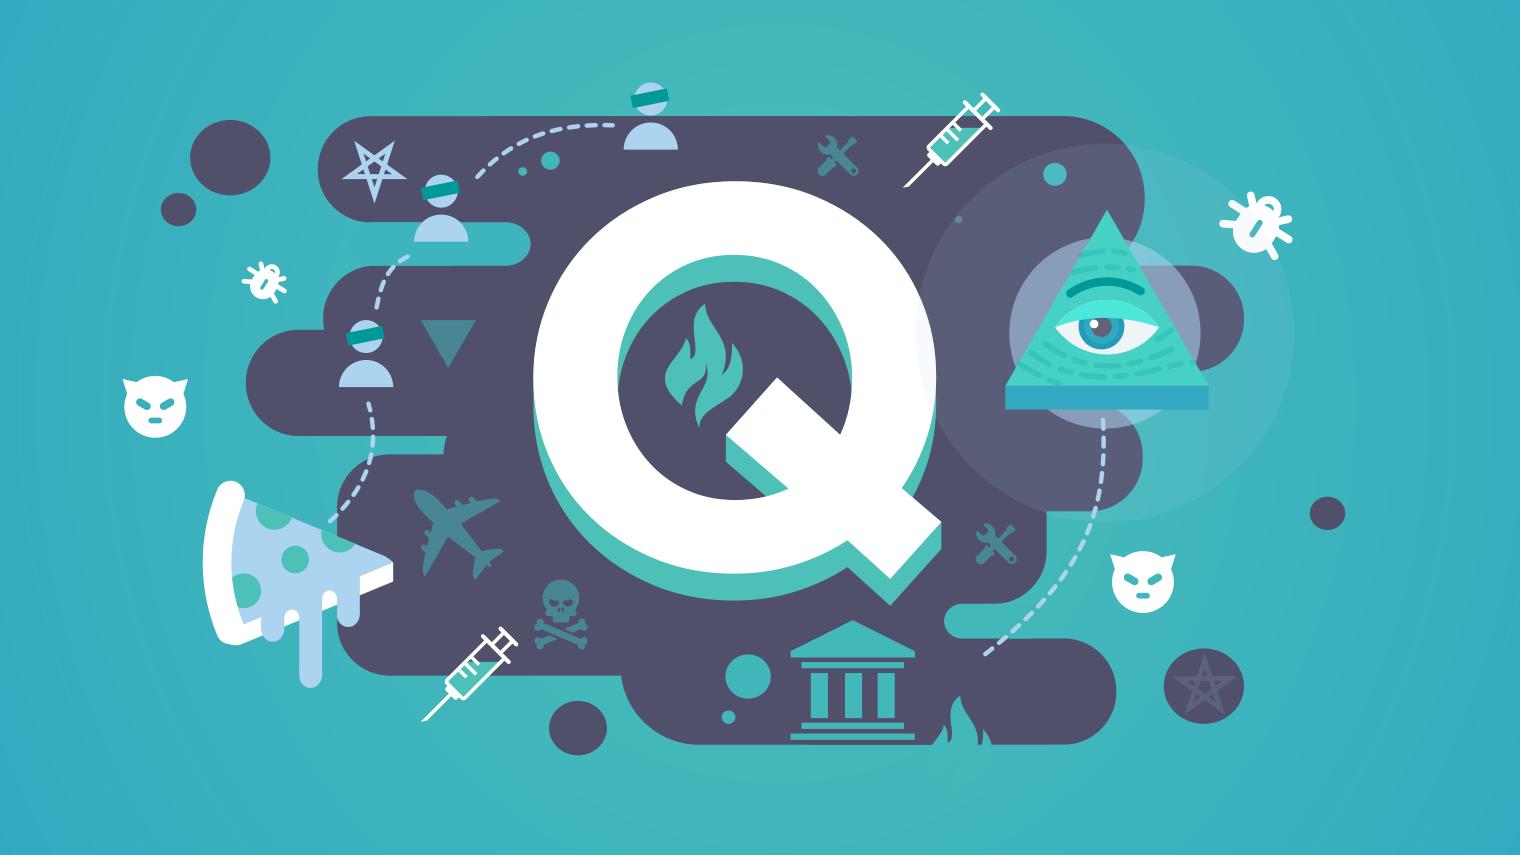 QAnon Blog-Conspiracies Show Organic Growth